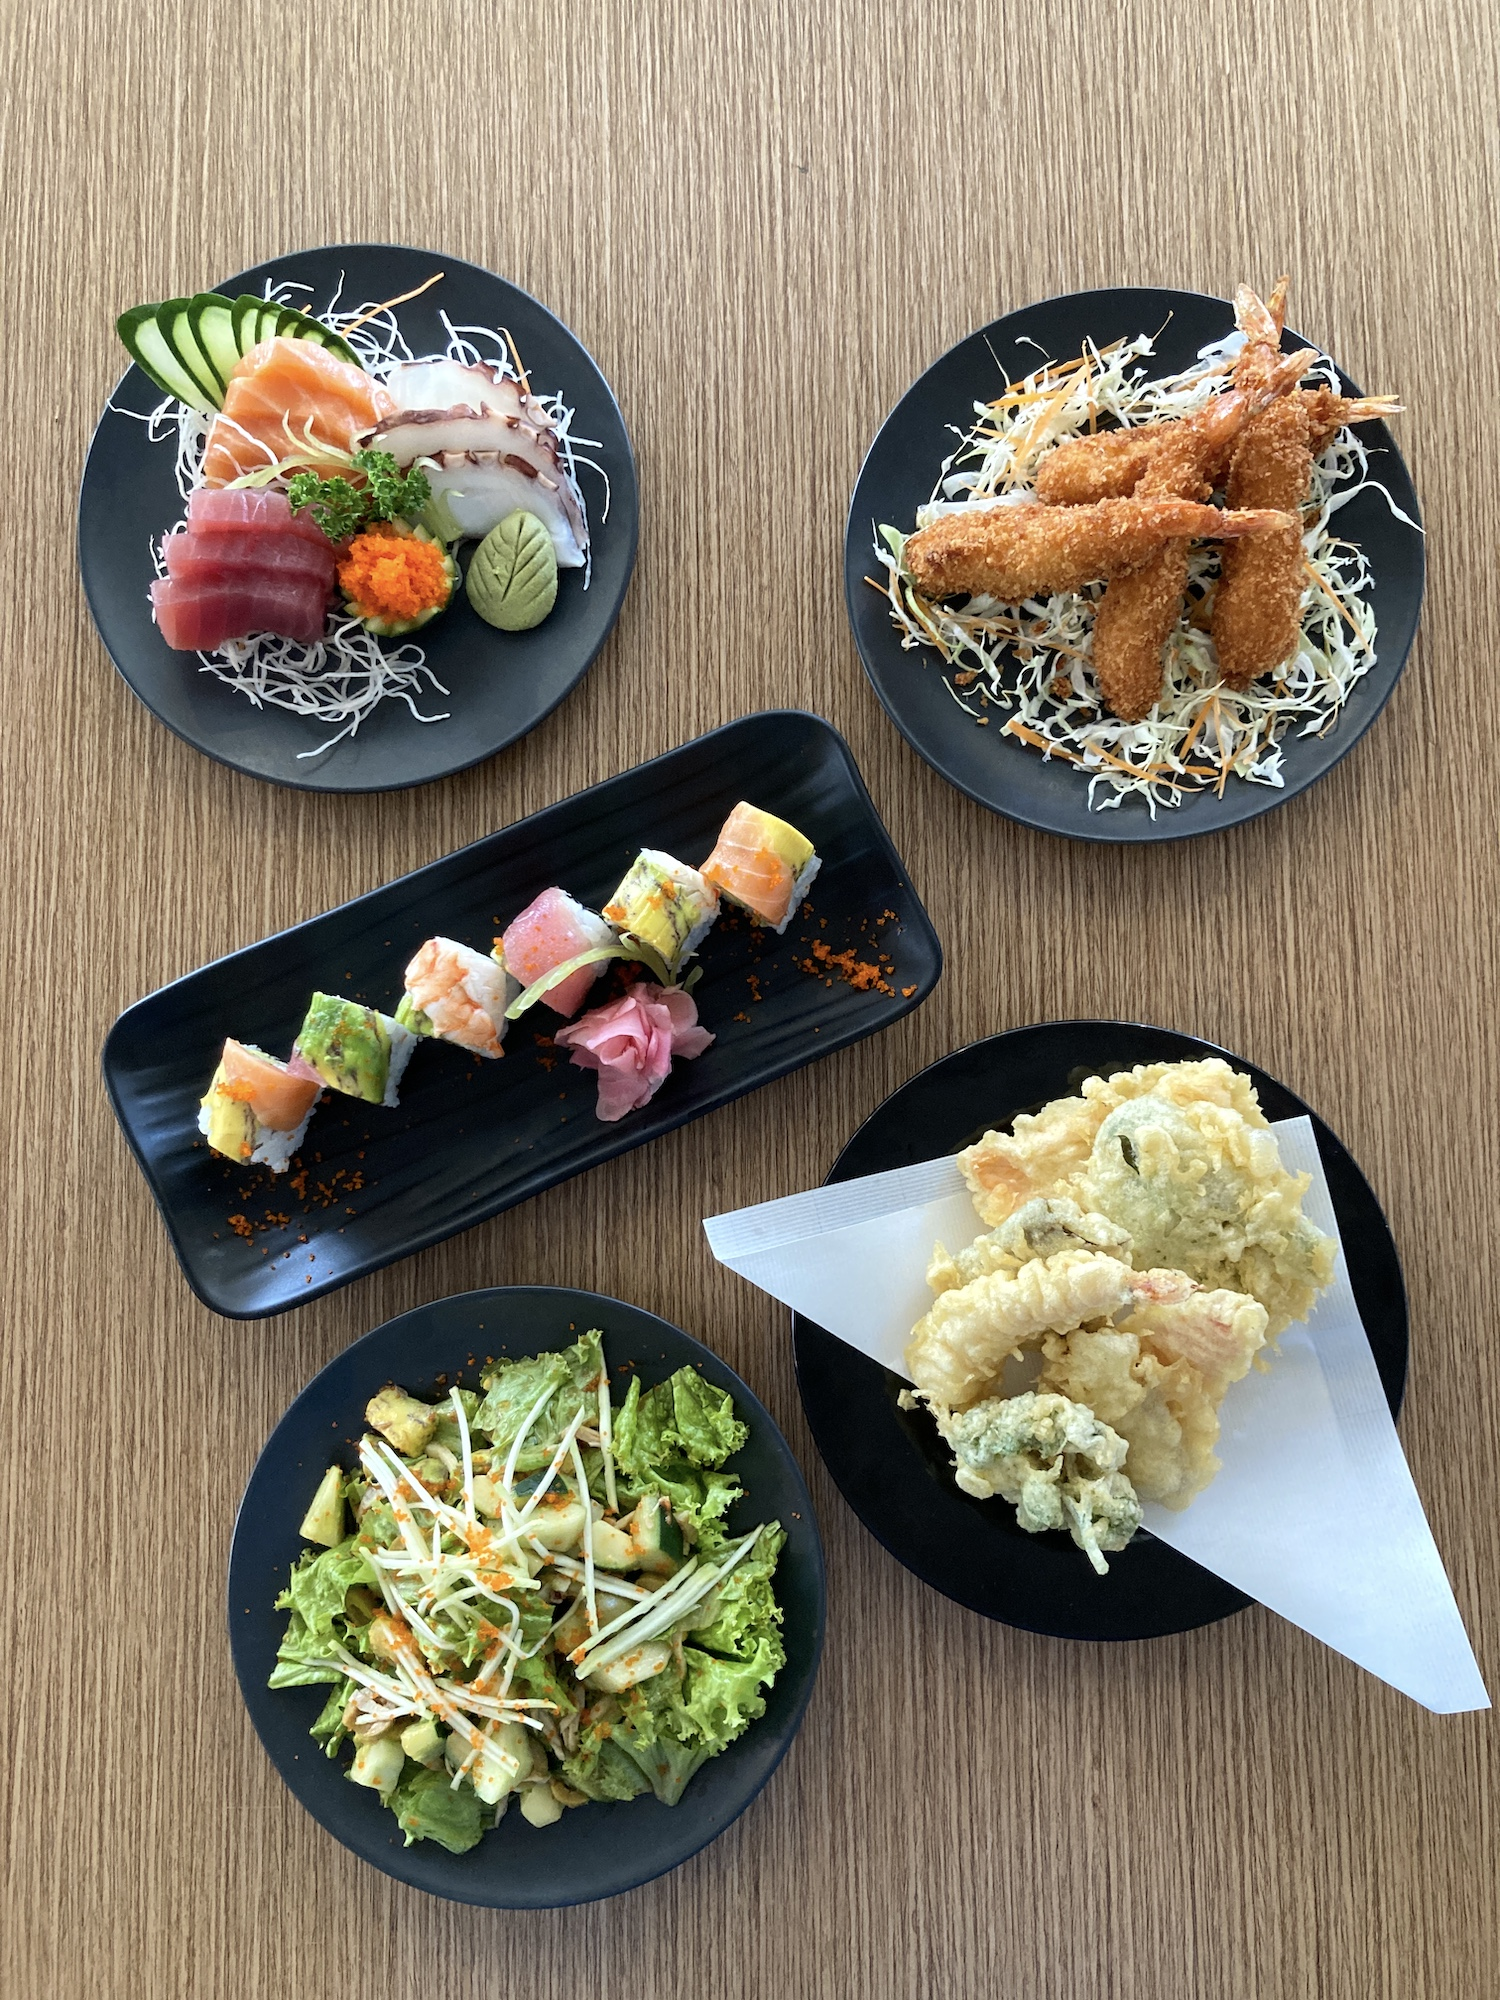 A sample of Gureisu Okawari's diverse menu—from sashimi and salads to sushi and temaki wraps